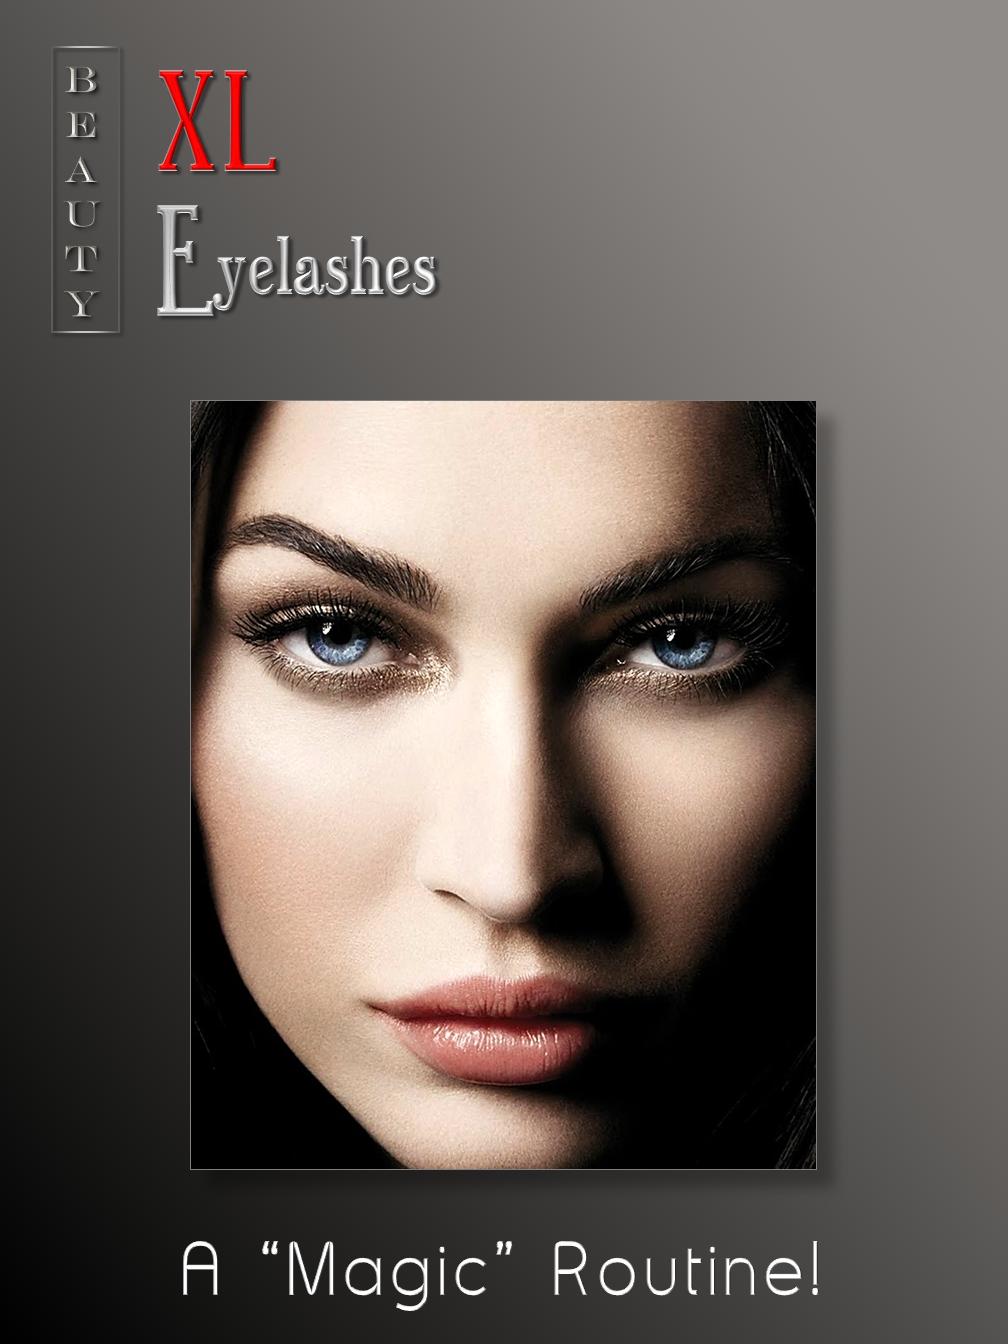 XL Eyelashes